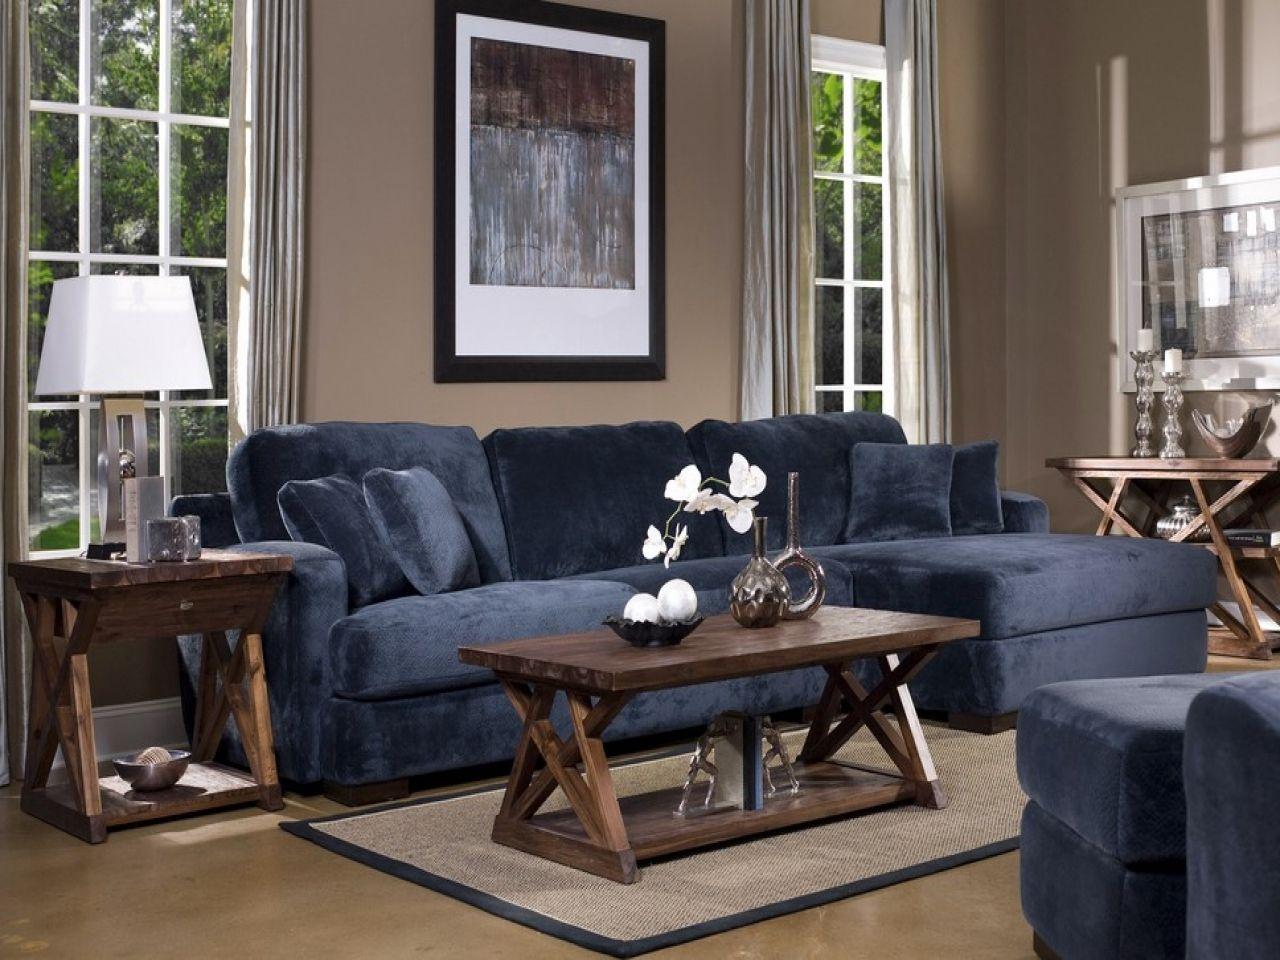 Ikea Modular Bookcase Navy Blue Sofa Living Room Dark Blue Couch Living Room Blue Sofa Living Blue Couch Living #navy #blue #couch #living #room #decor